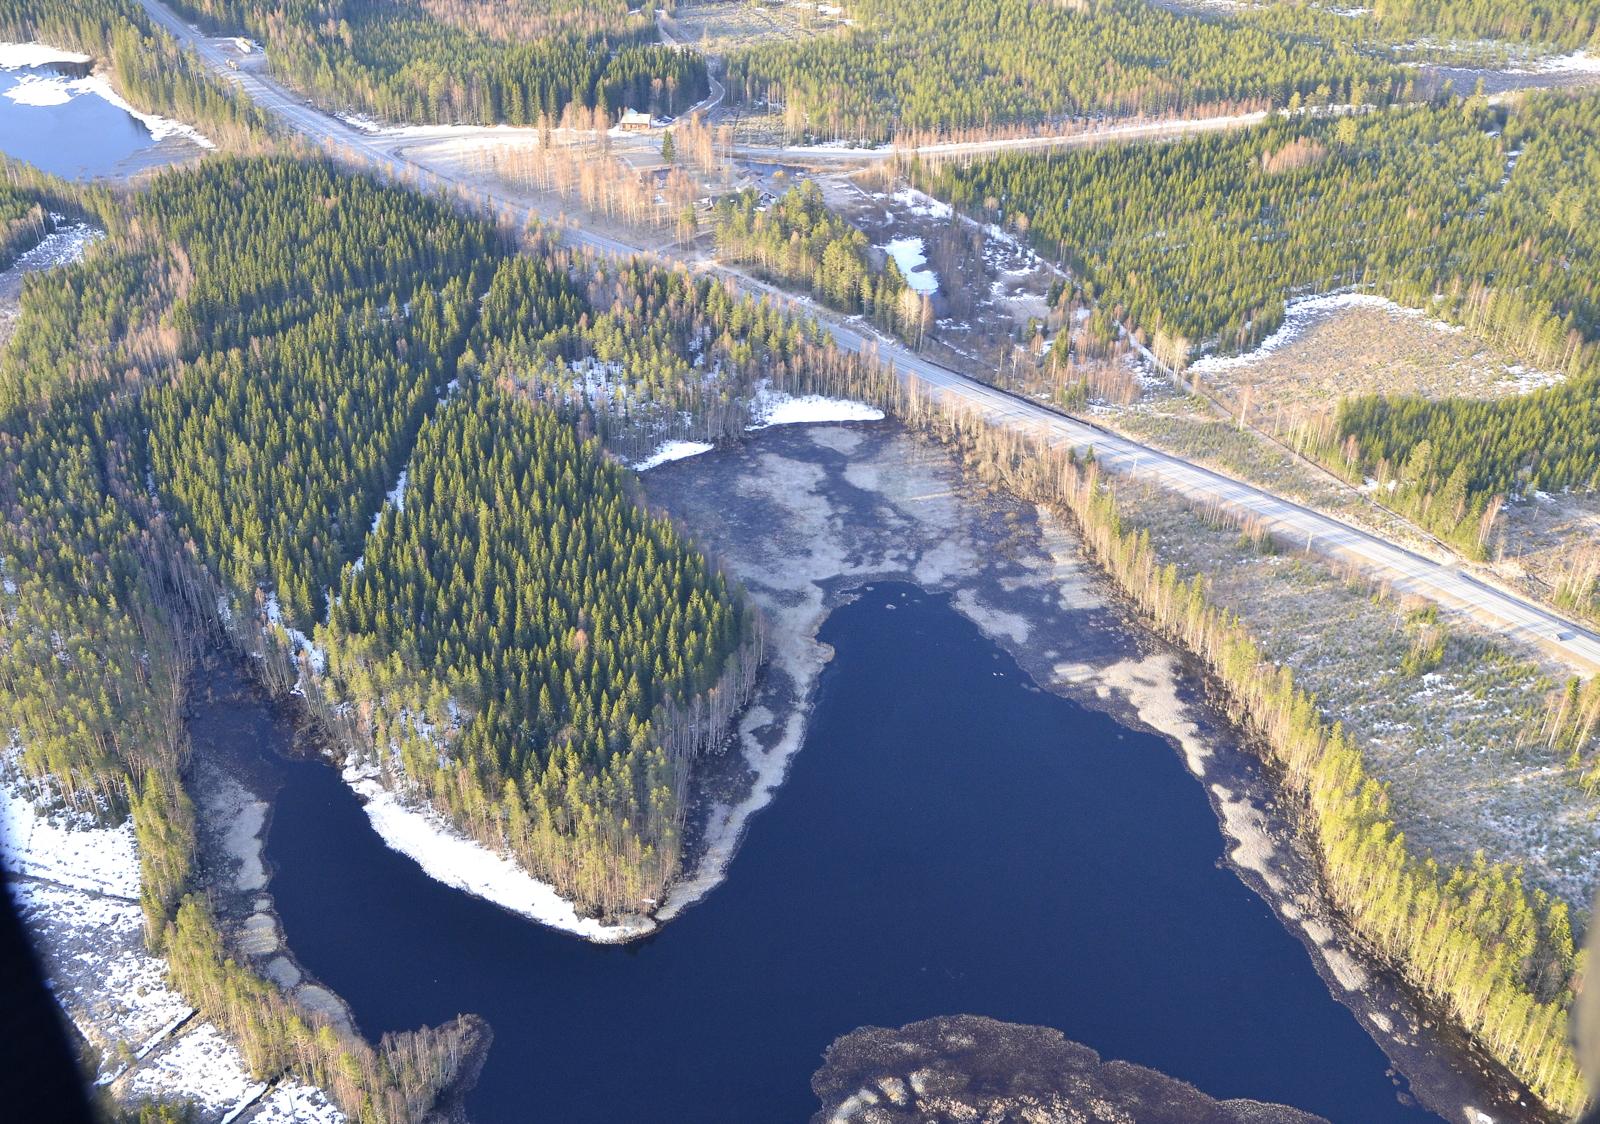 Keski-Viitajärvi Kinnulan ja 4-tien risteyksessä.